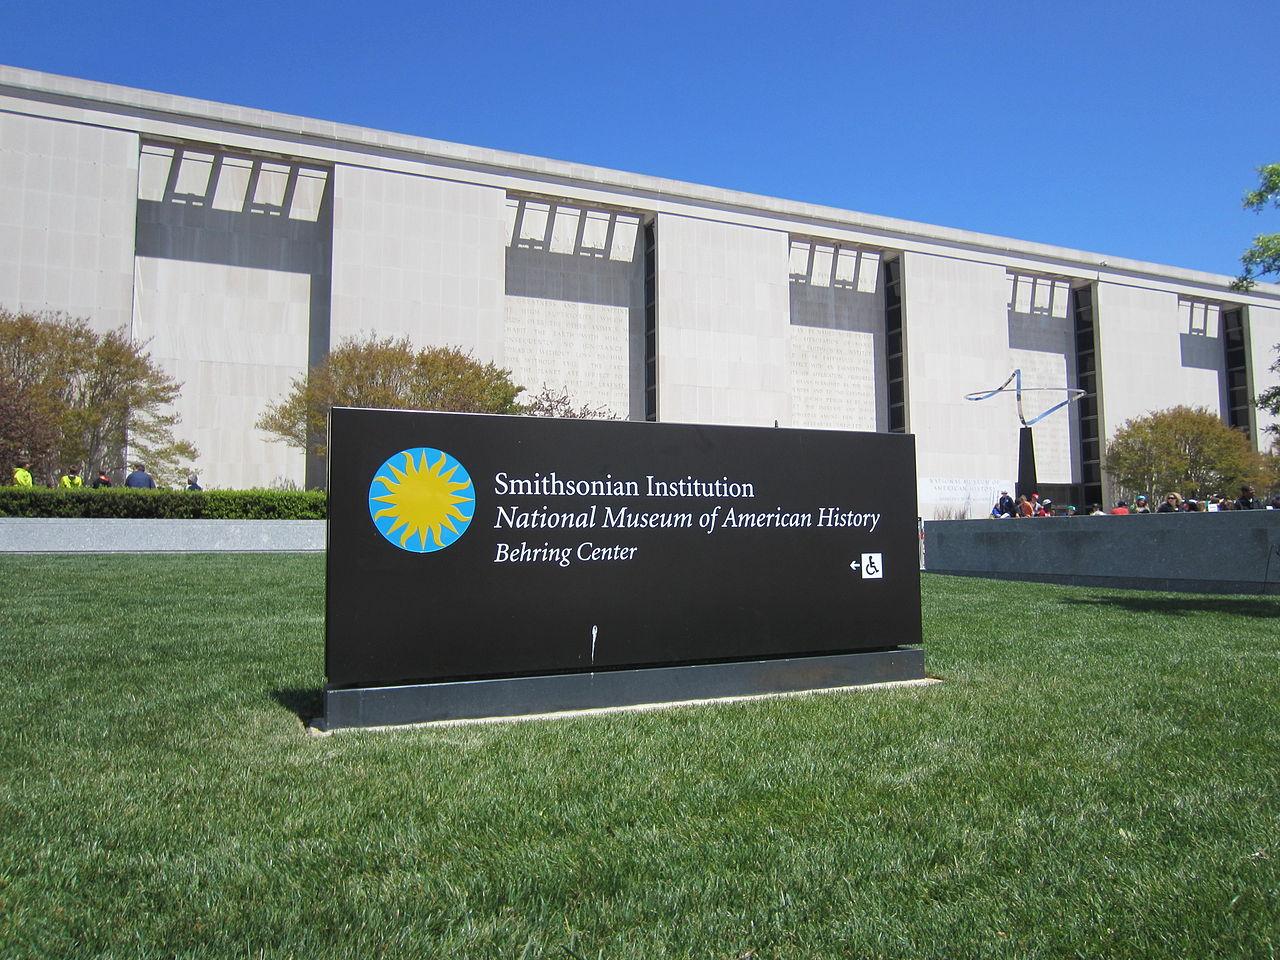 National Museum of American History, Washington, DC